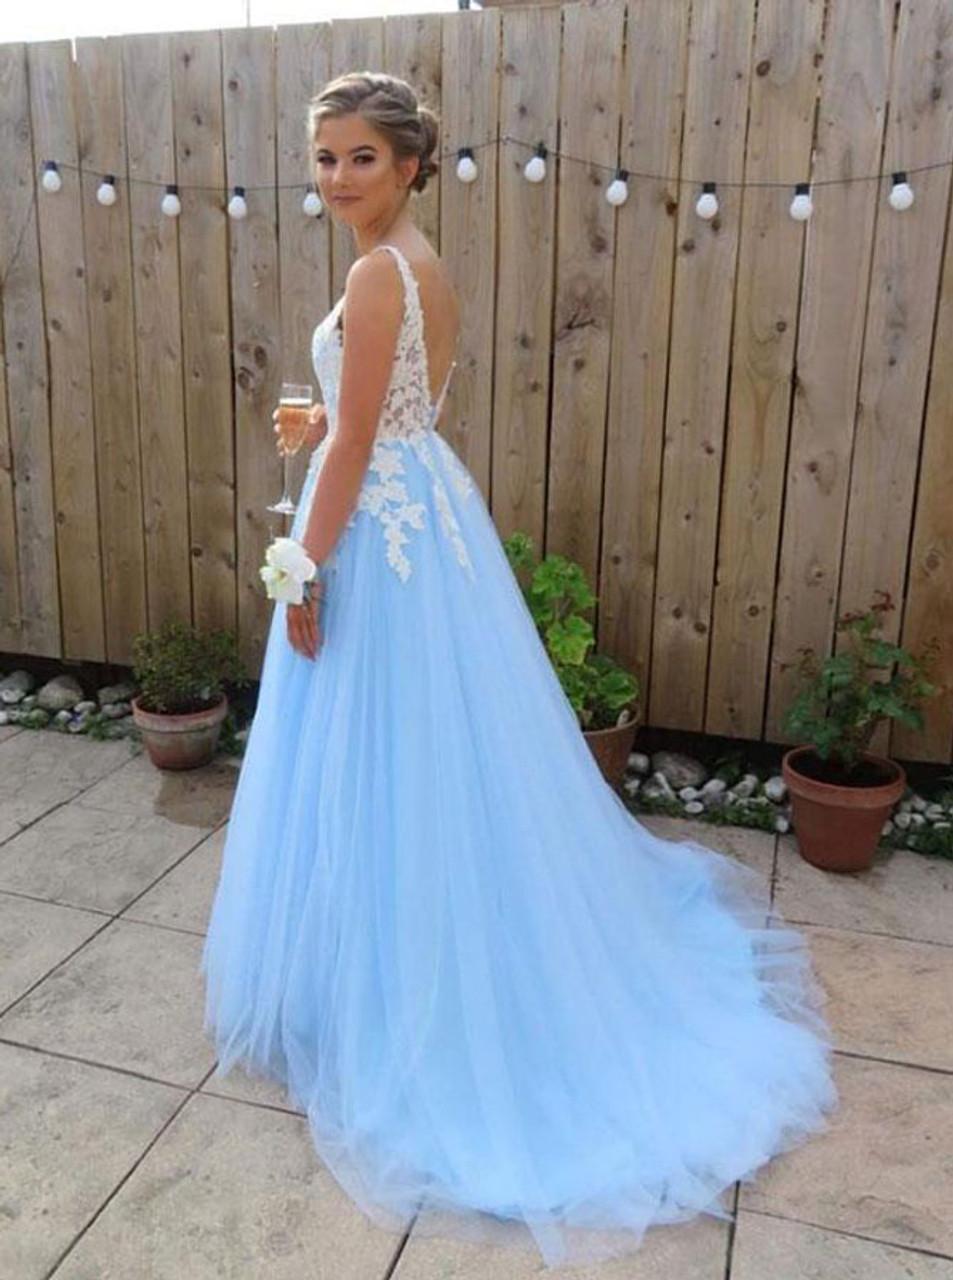 SkyBlue Strapless Prom Dresses,Tulle Prom Dress for Teen